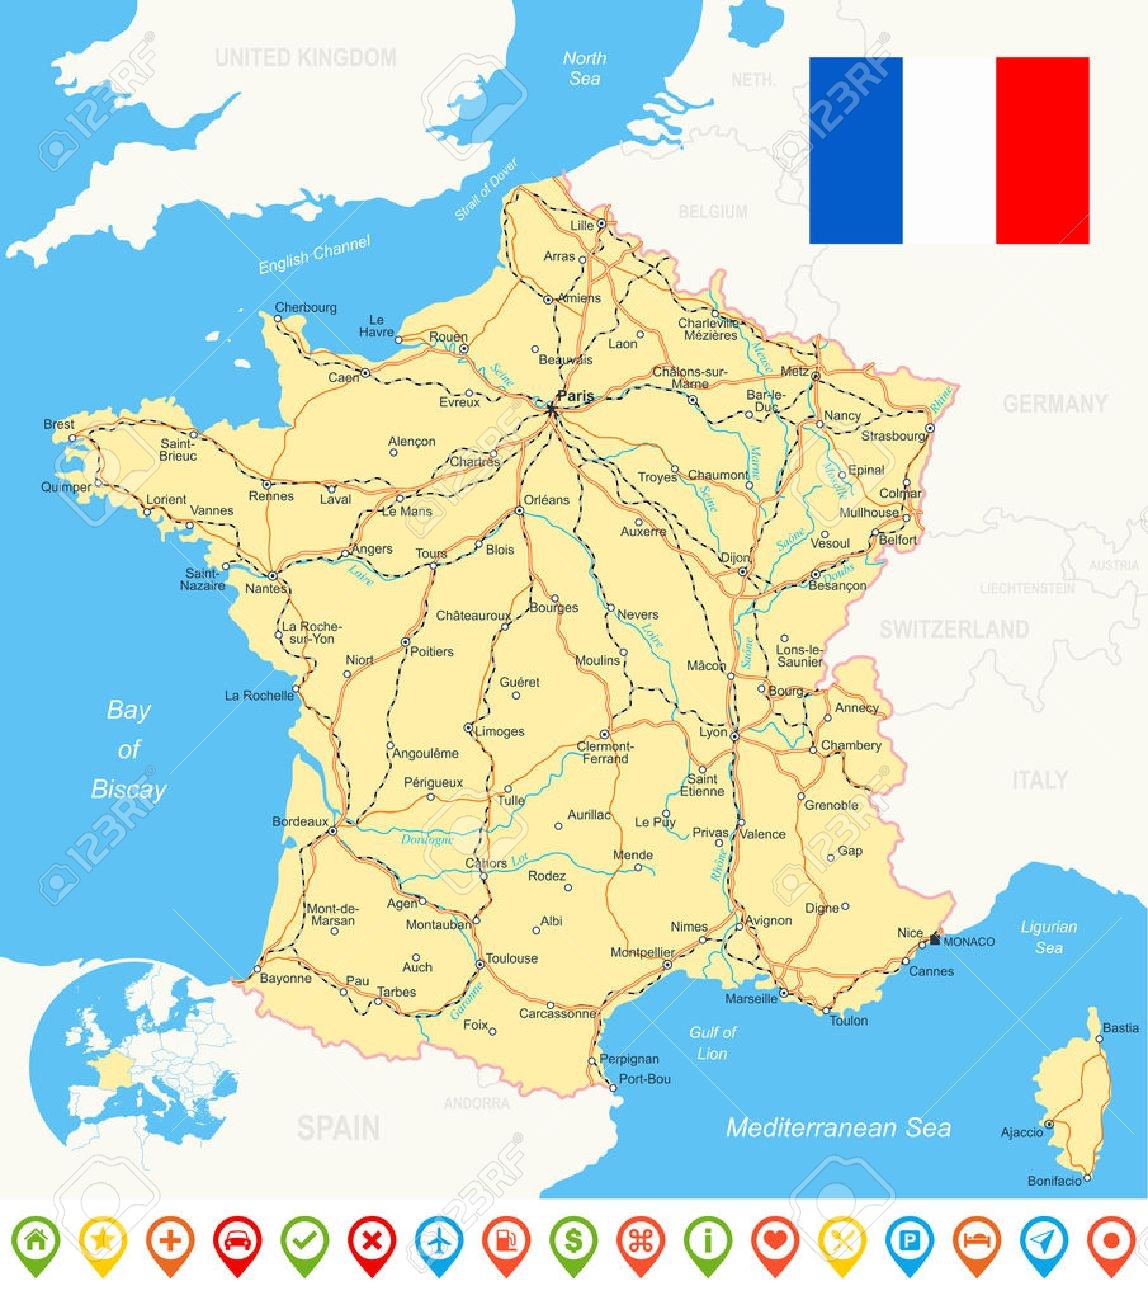 Frankreich Karte Flagge Navigationssymbole Strassen Flusse